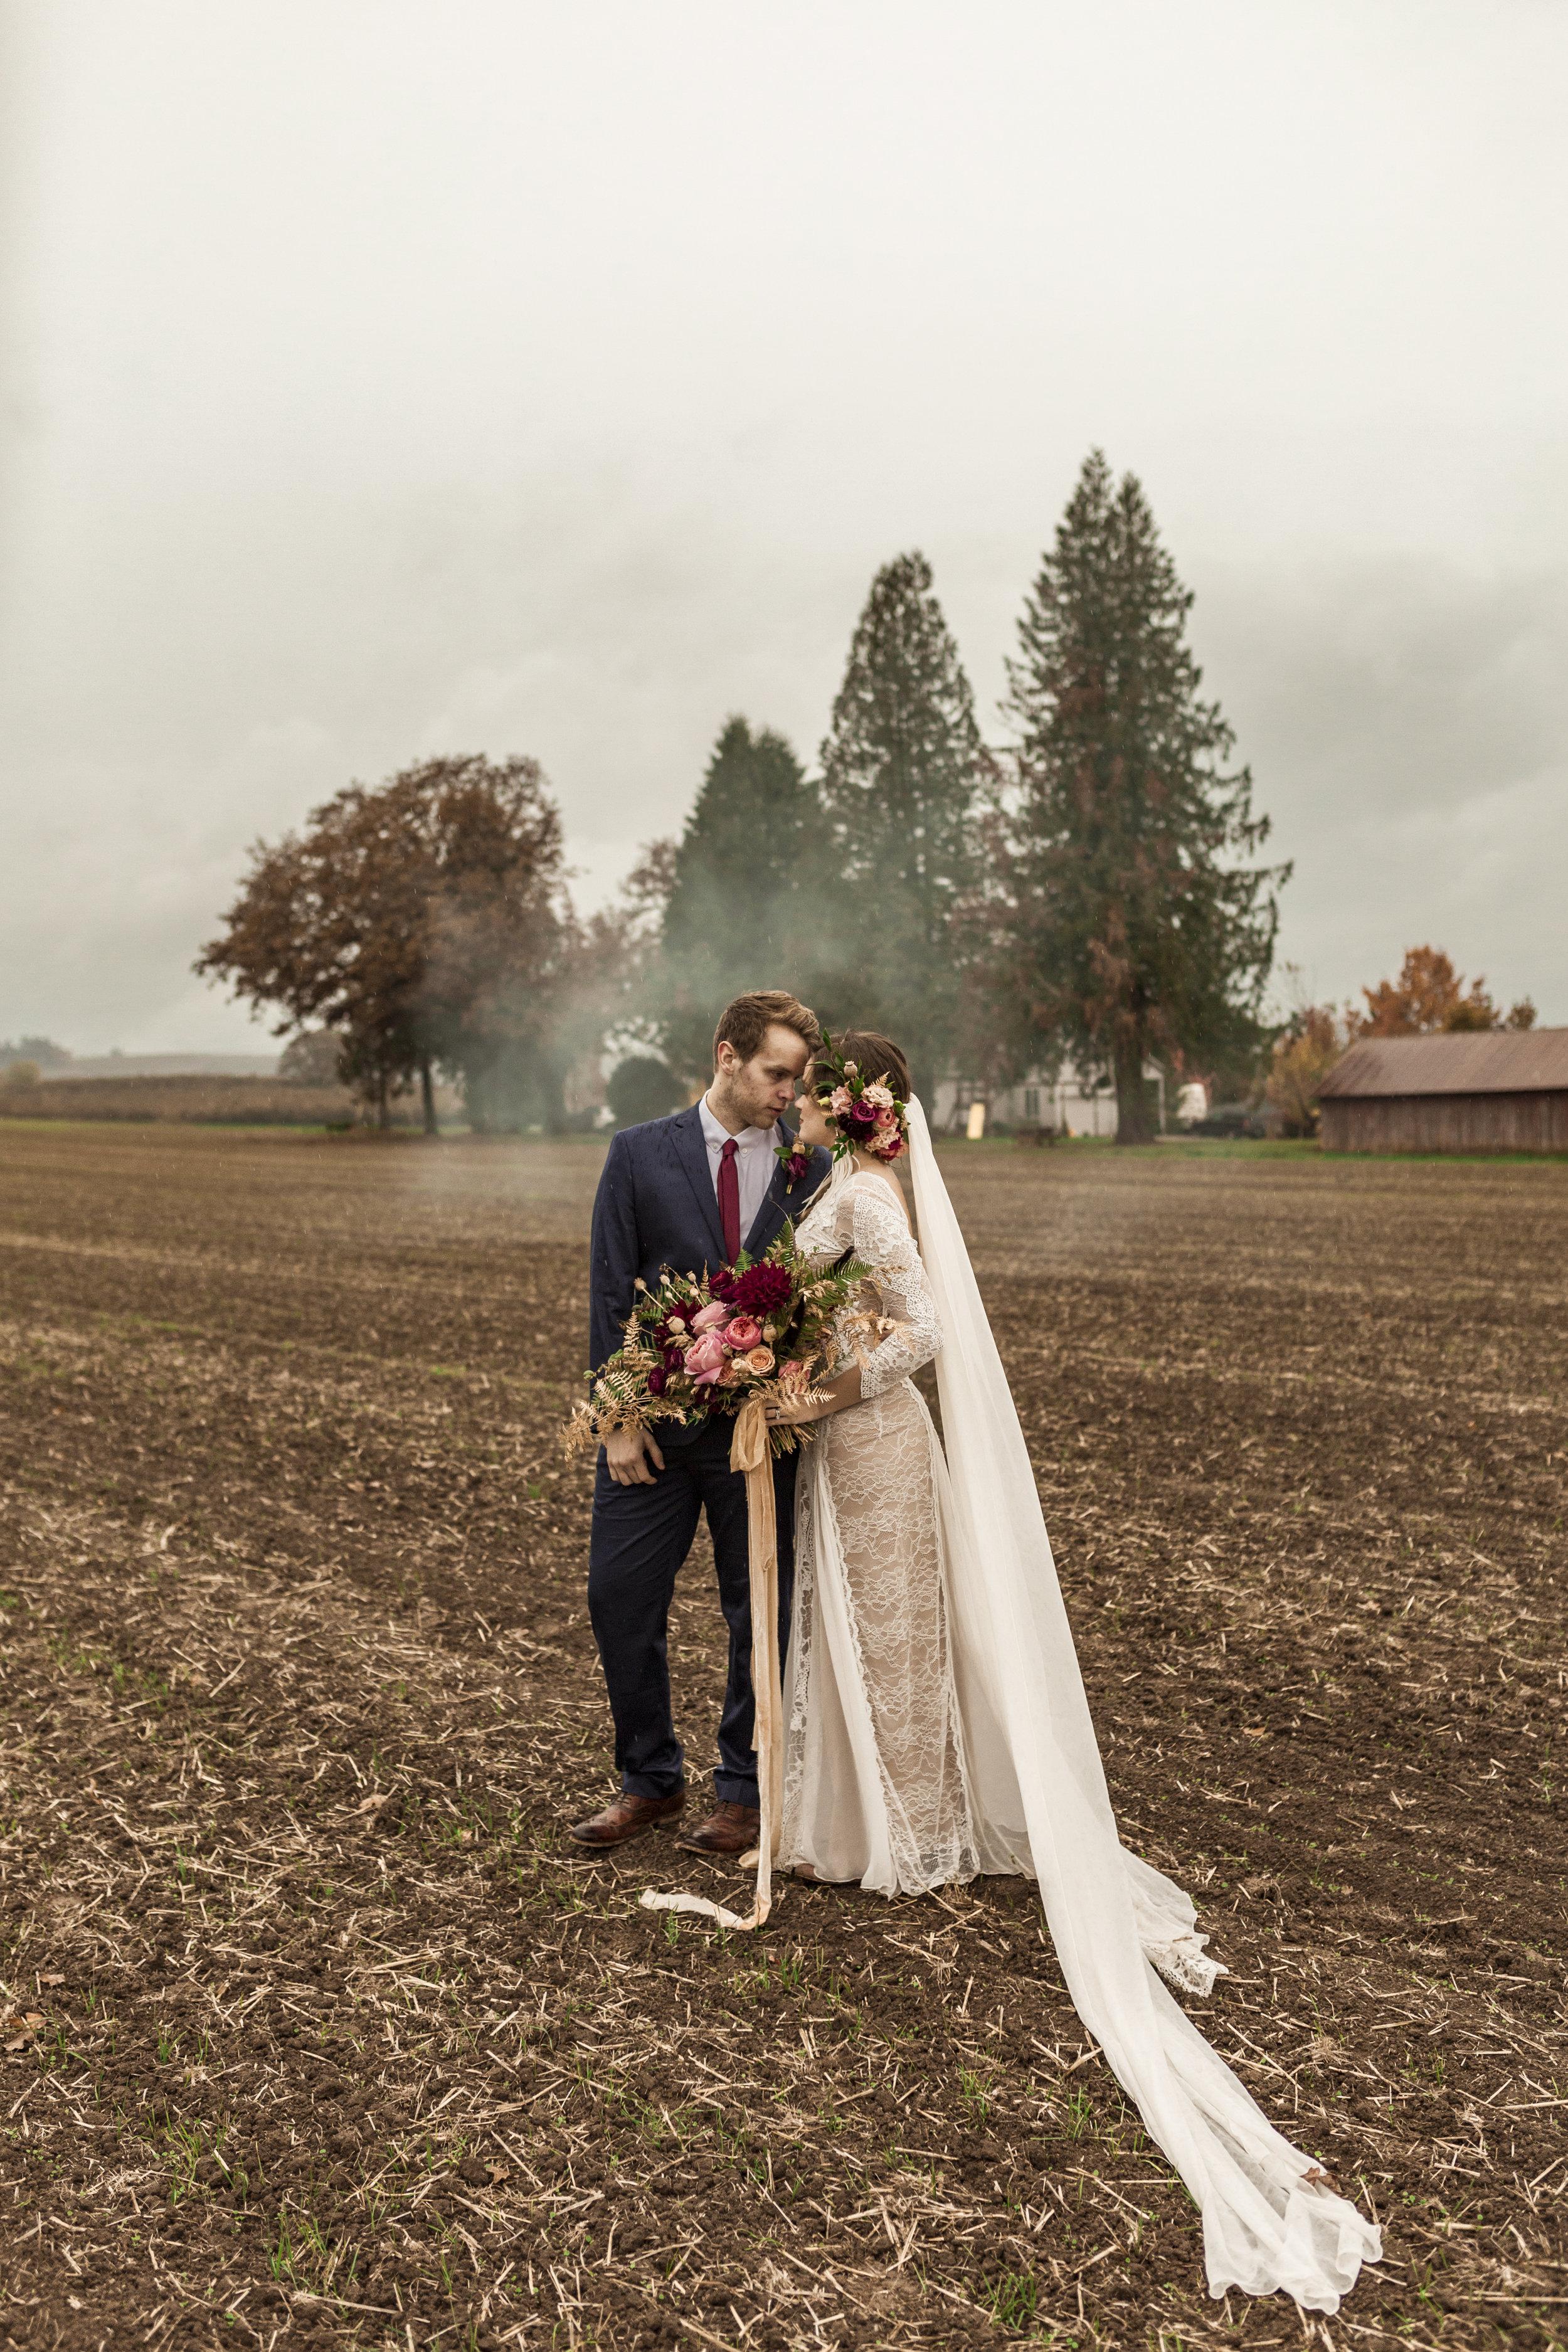 PNW Elopement | Forest Grove, Oregon | Bri Bergman Photography 043.JPG